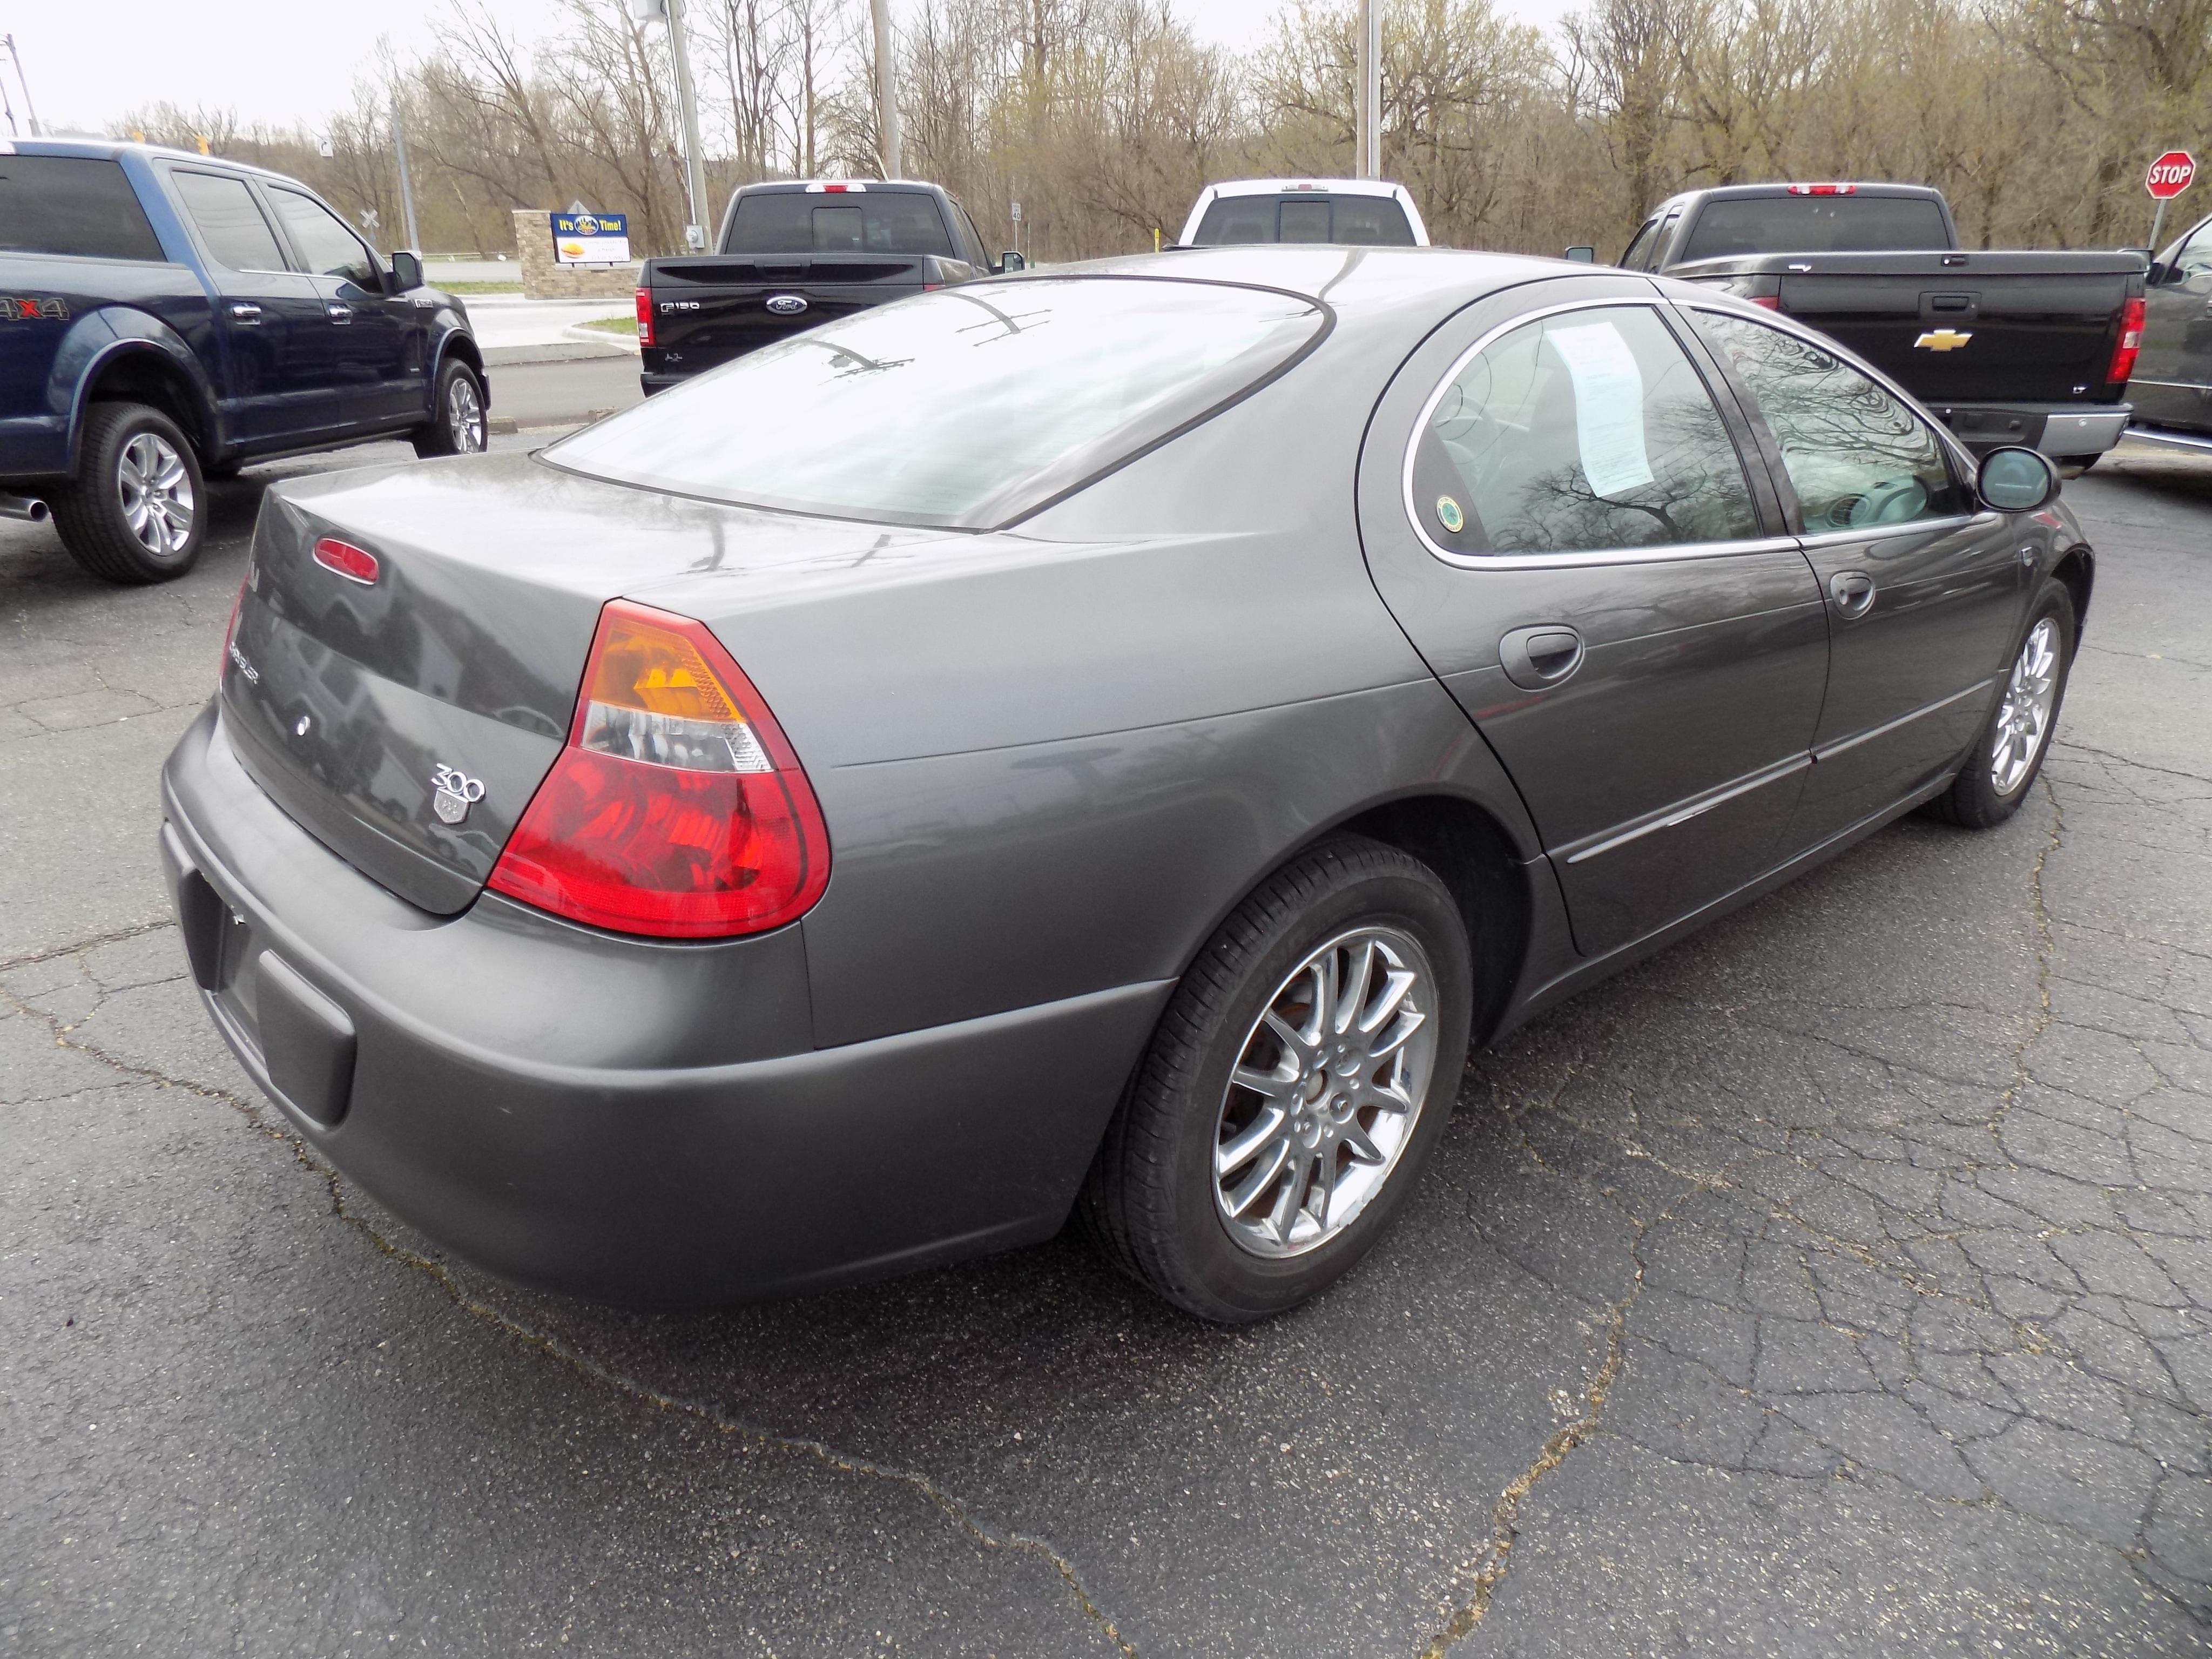 Used 2002 Chrysler 300M For Sale | Brookville IN | VIN